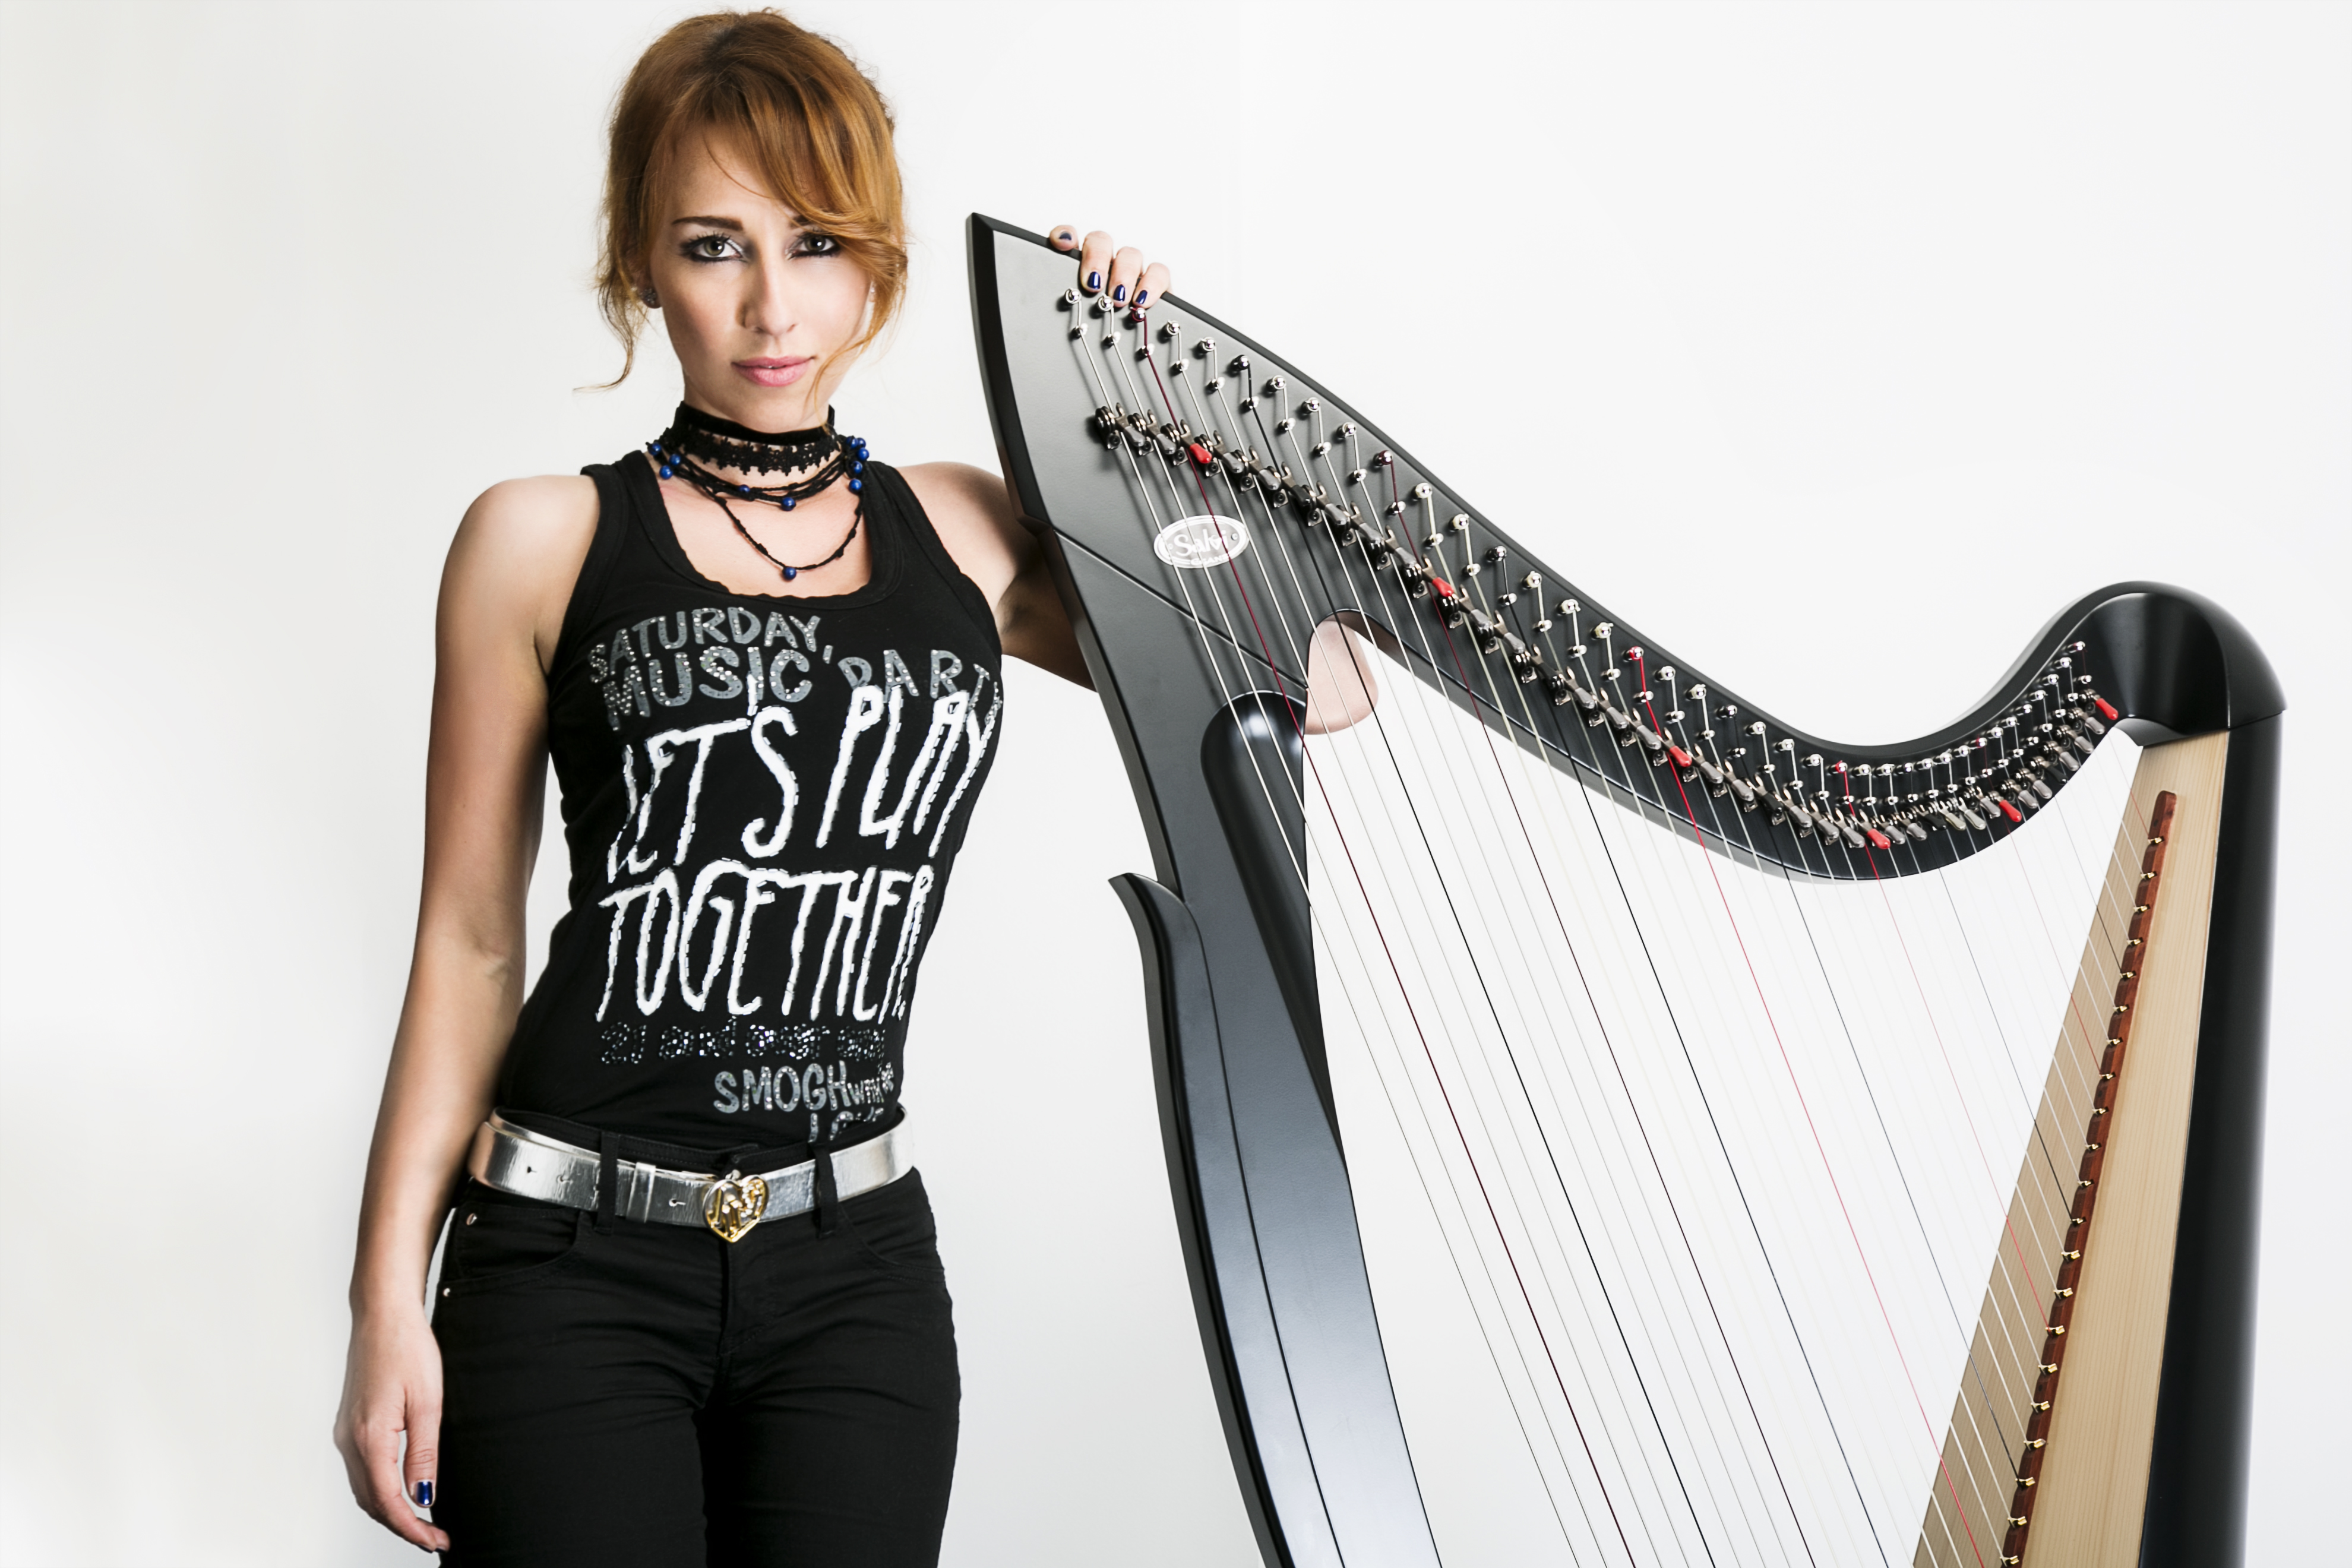 micol harp